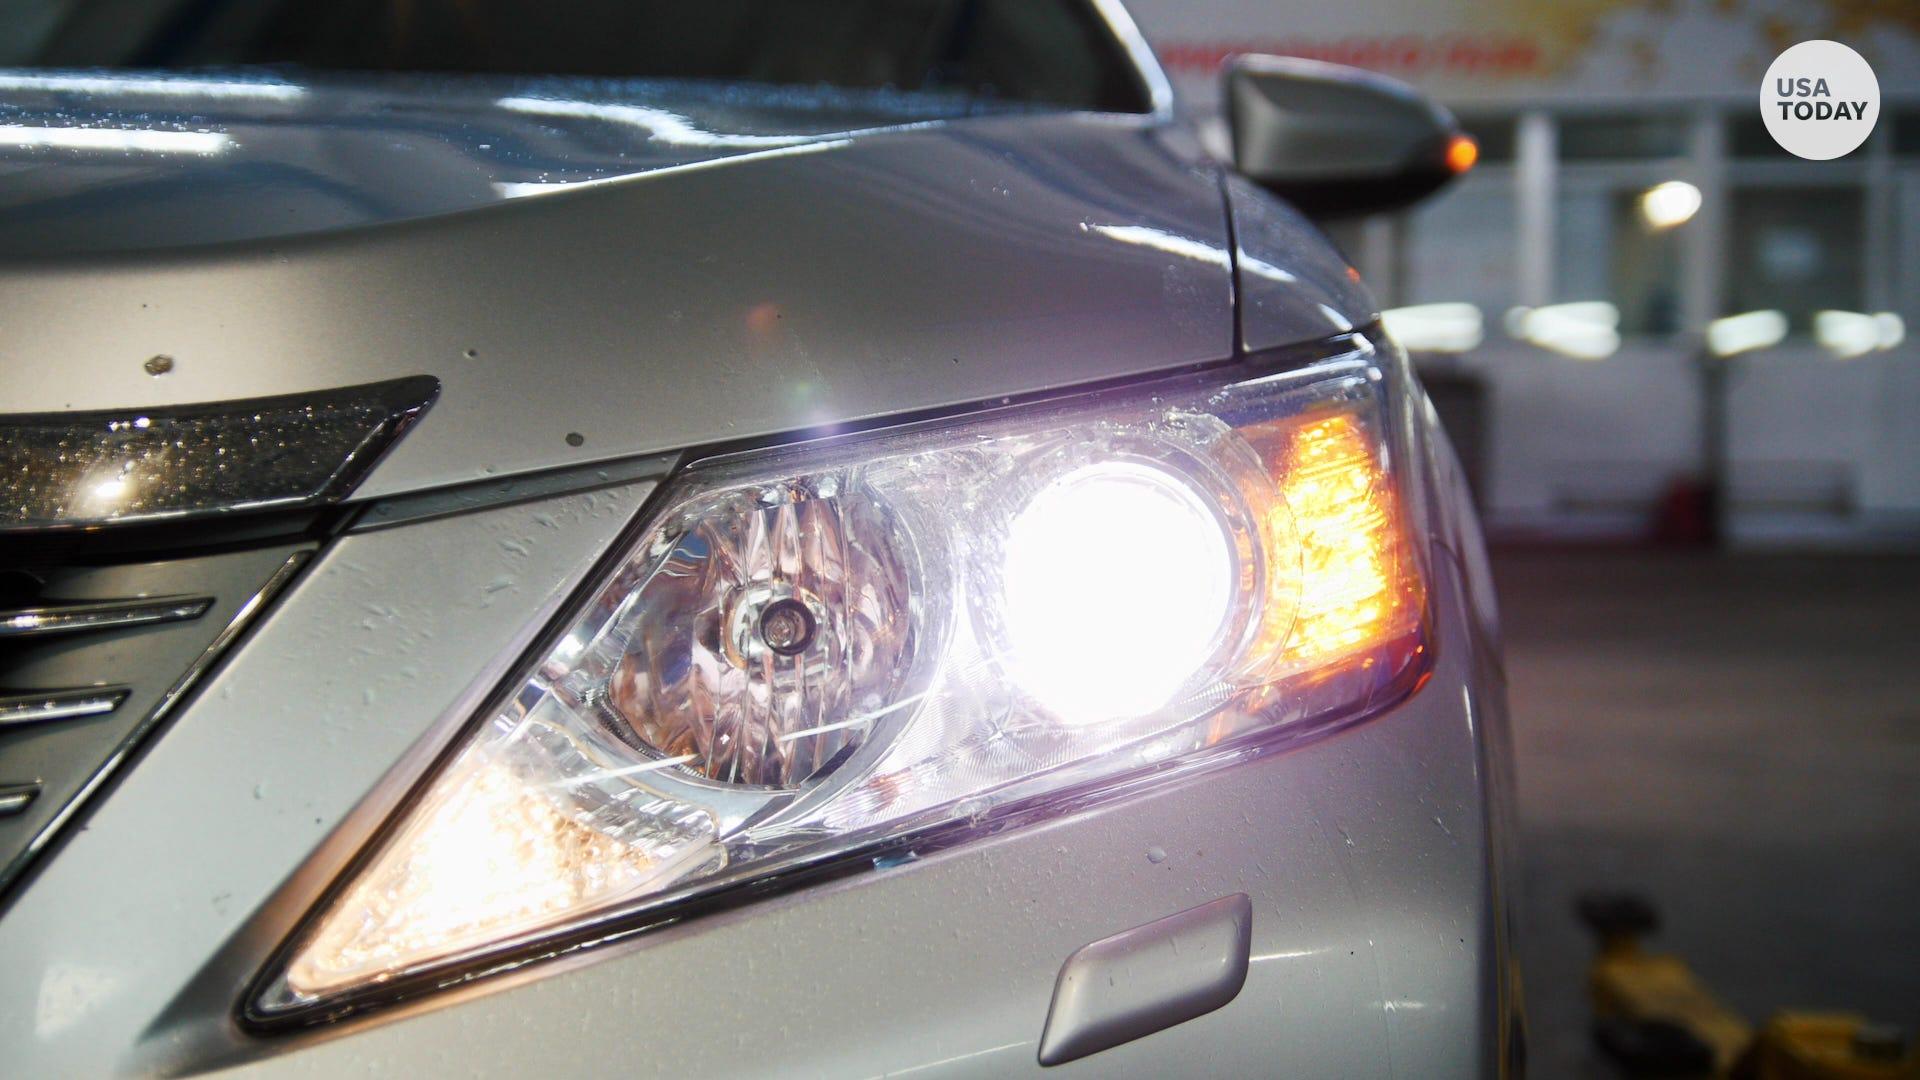 2021 cars, trucks, SUVs have better headlights, IIHS says